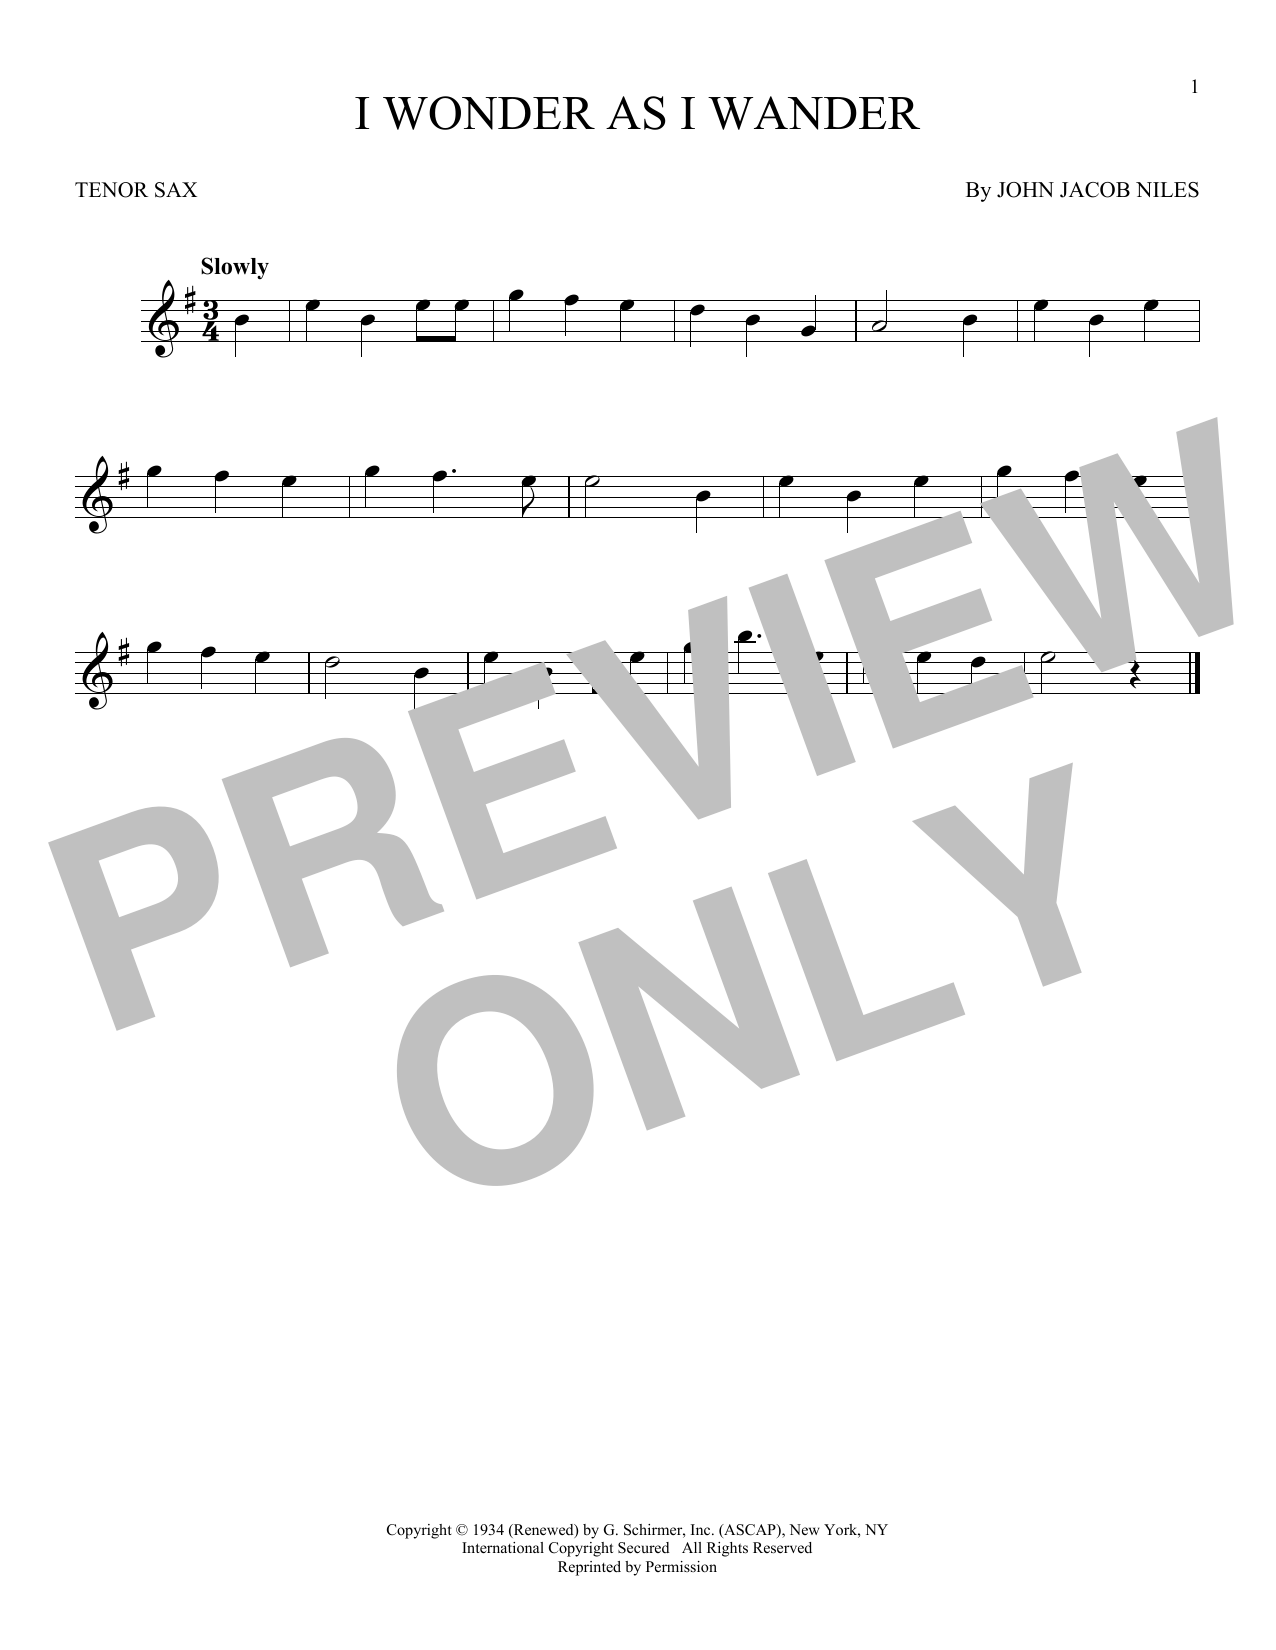 Partition saxophone I Wonder As I Wander de John Jacob Niles - Sax Tenor